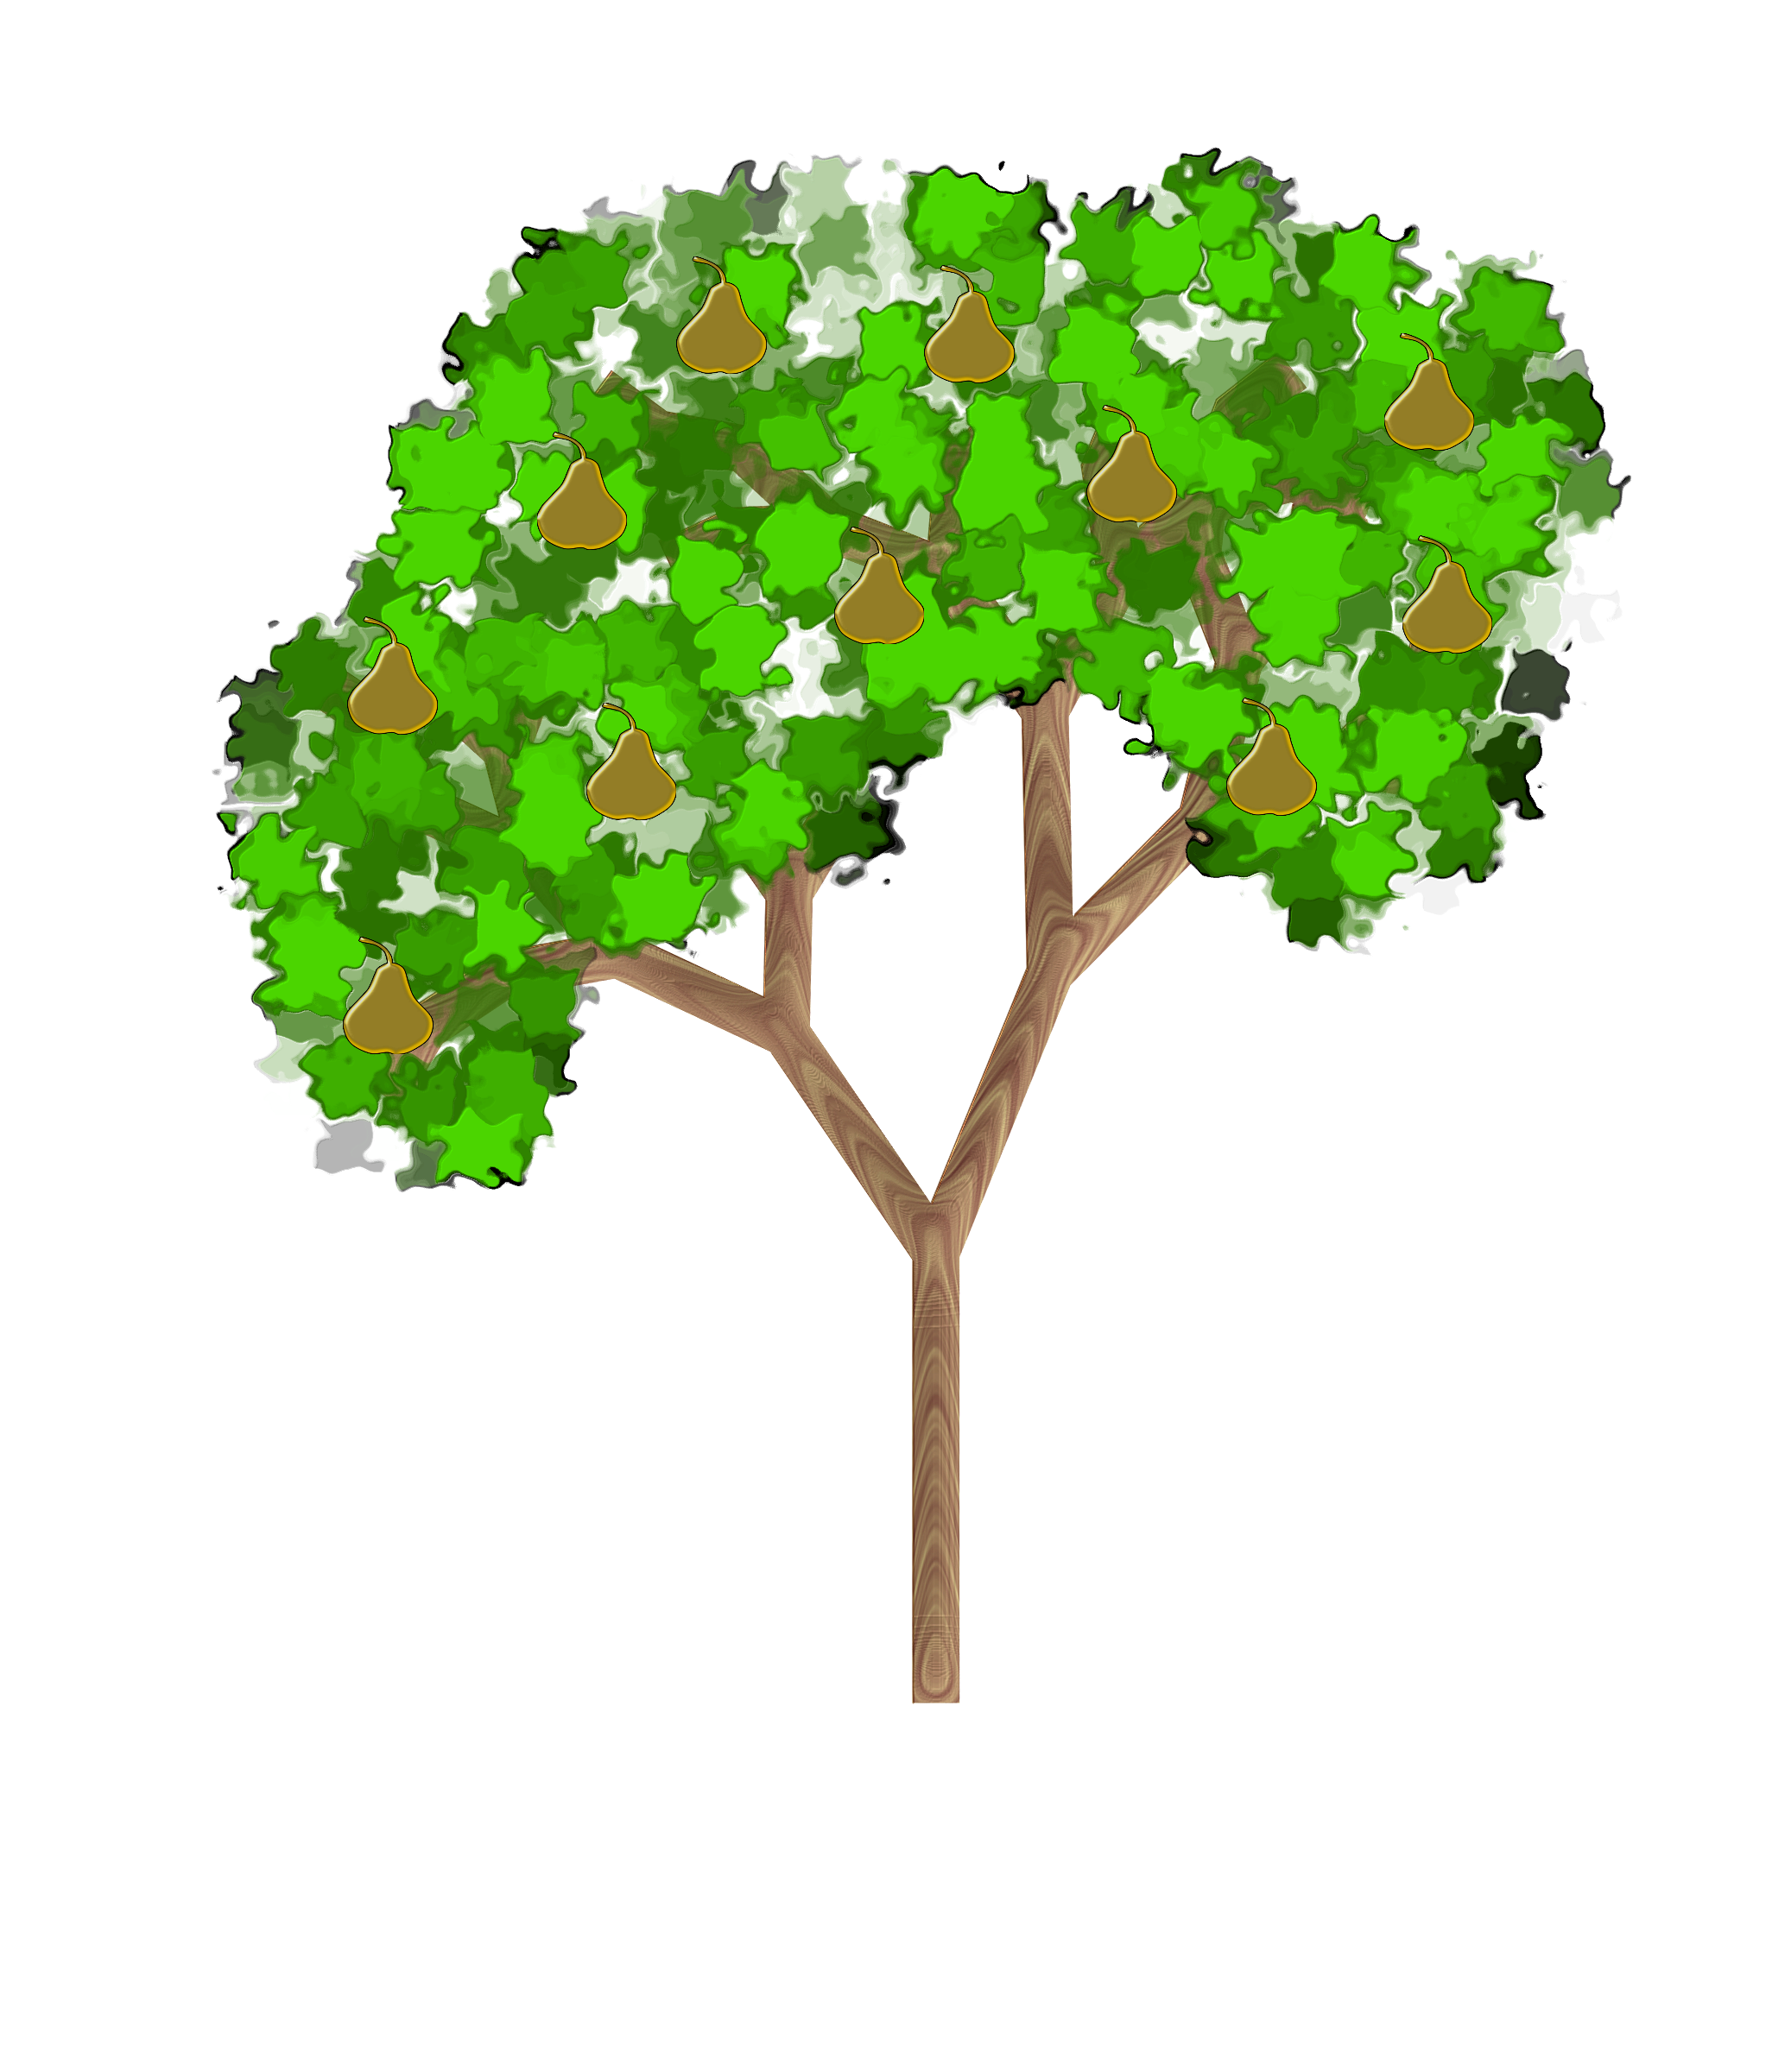 Tree big image png. Pear clipart jambu